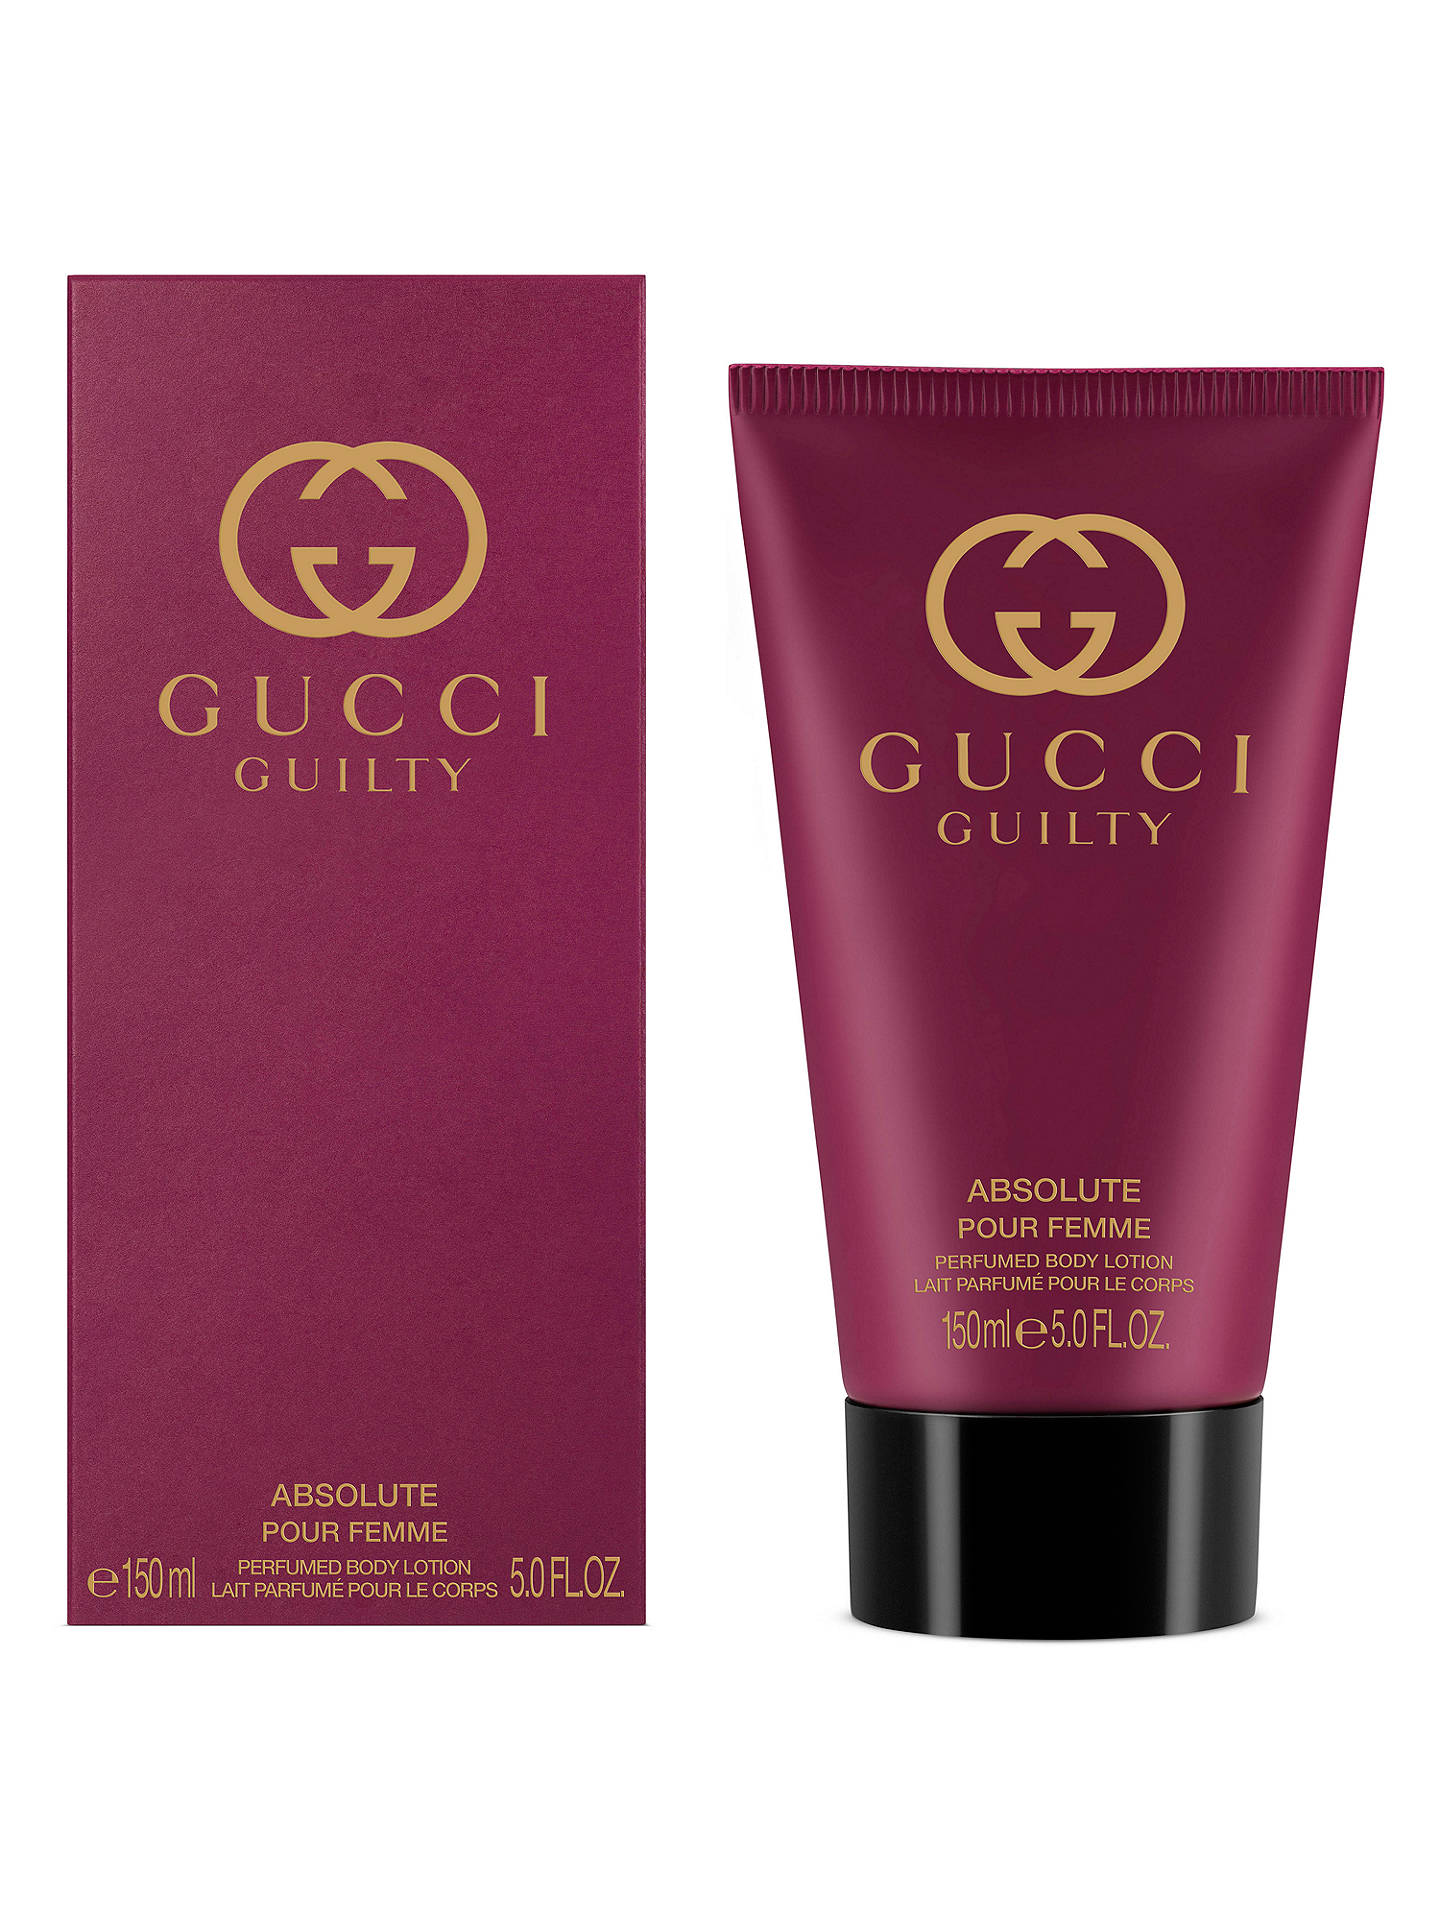 0d20590d2 ... Buy Gucci Guilty Absolute Eau de Parfum for Her Body Lotion, 150ml  Online at johnlewis